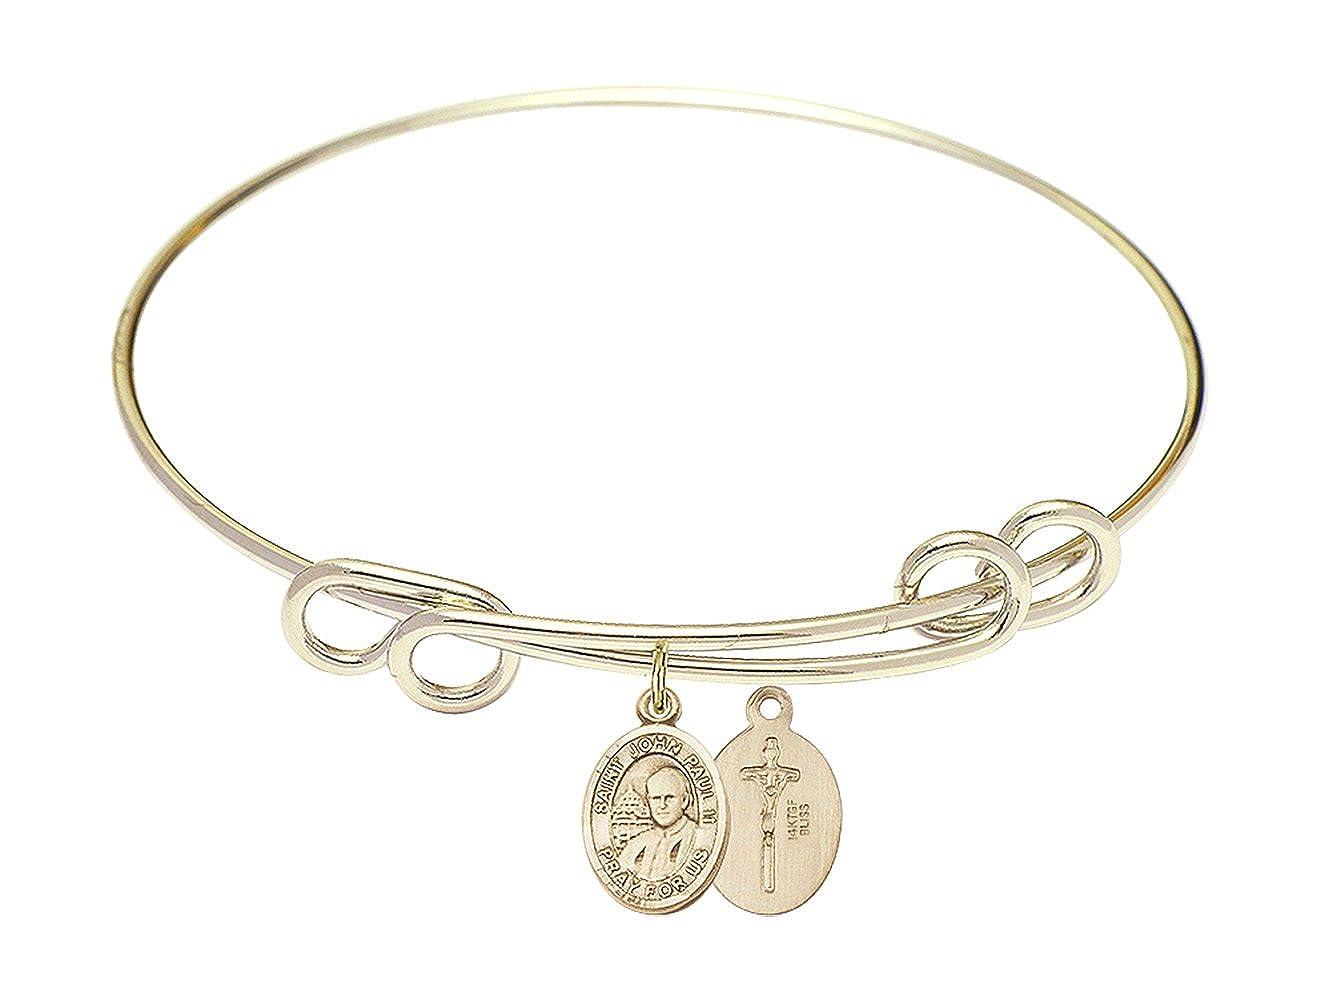 John Paul II Charm. DiamondJewelryNY Double Loop Bangle Bracelet with a St